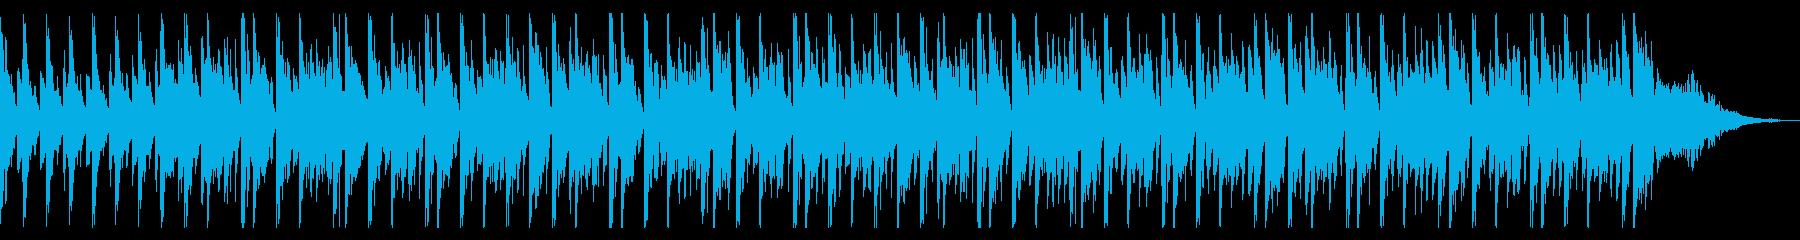 125 BPMの再生済みの波形